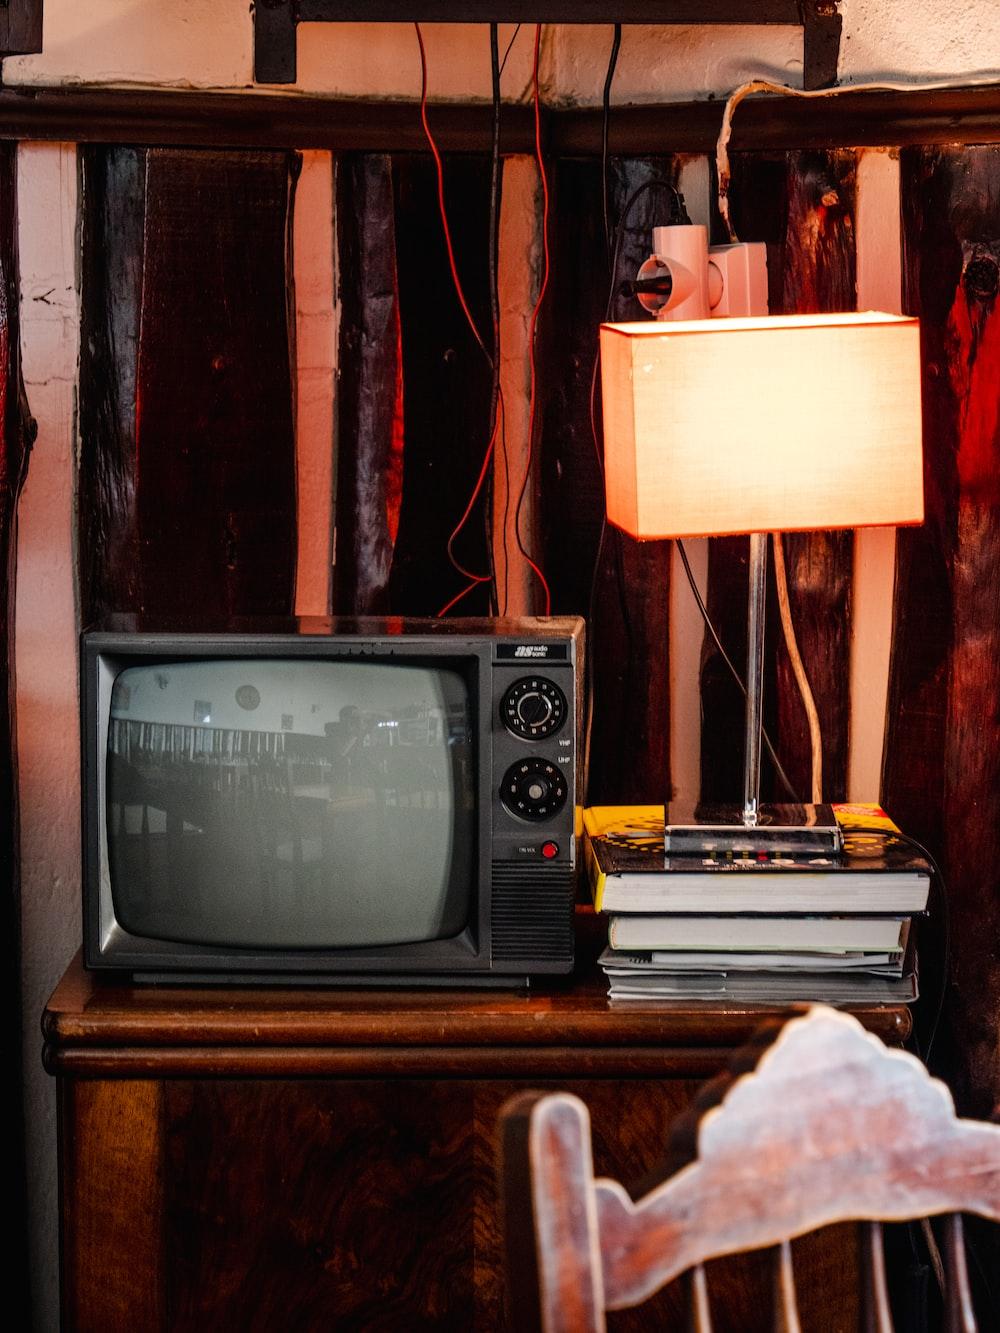 black CRT TV